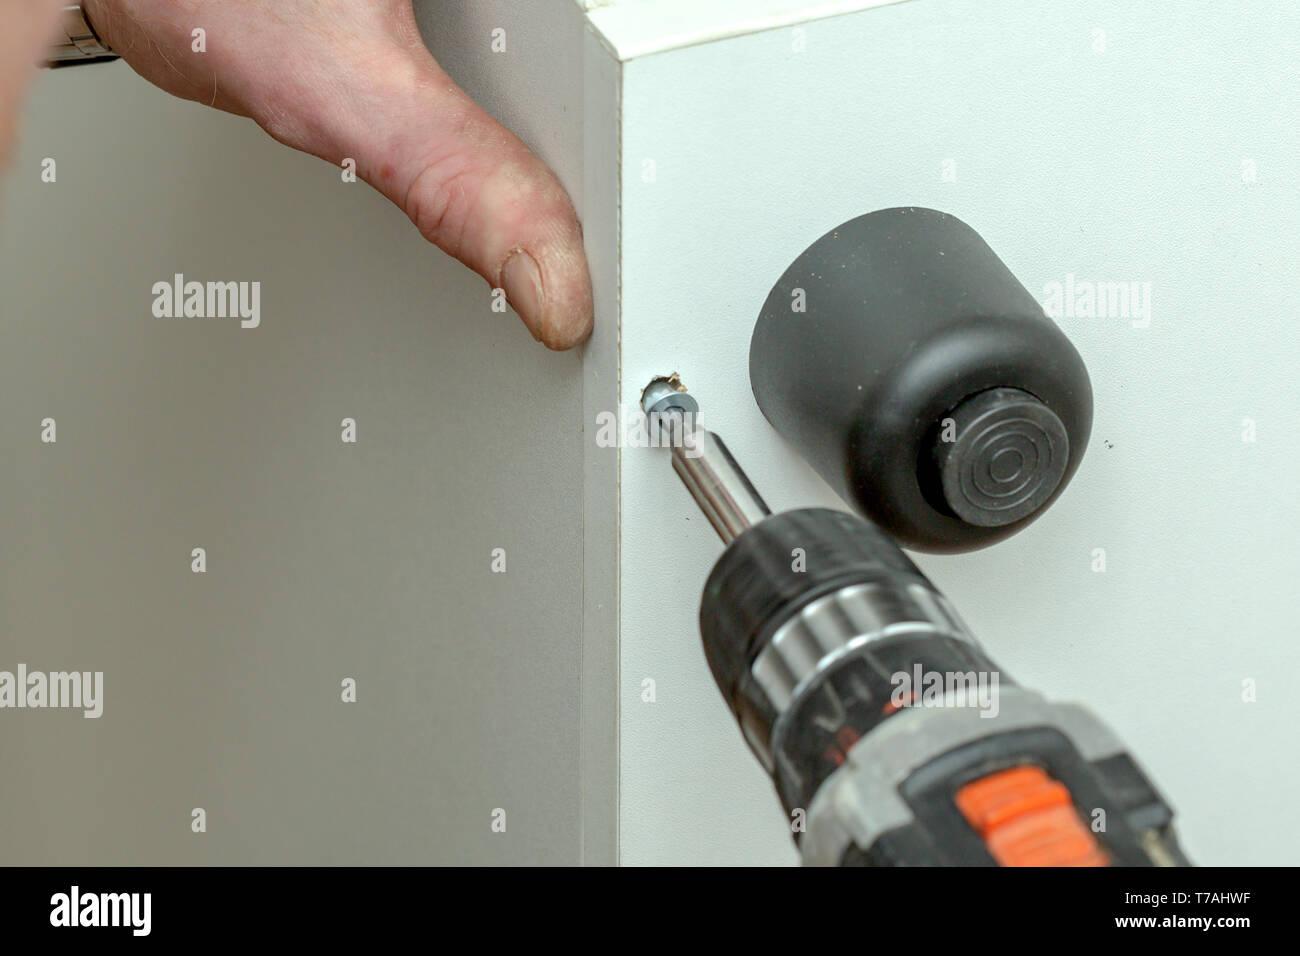 The process of furniture assembly screws closeup - Stock Image